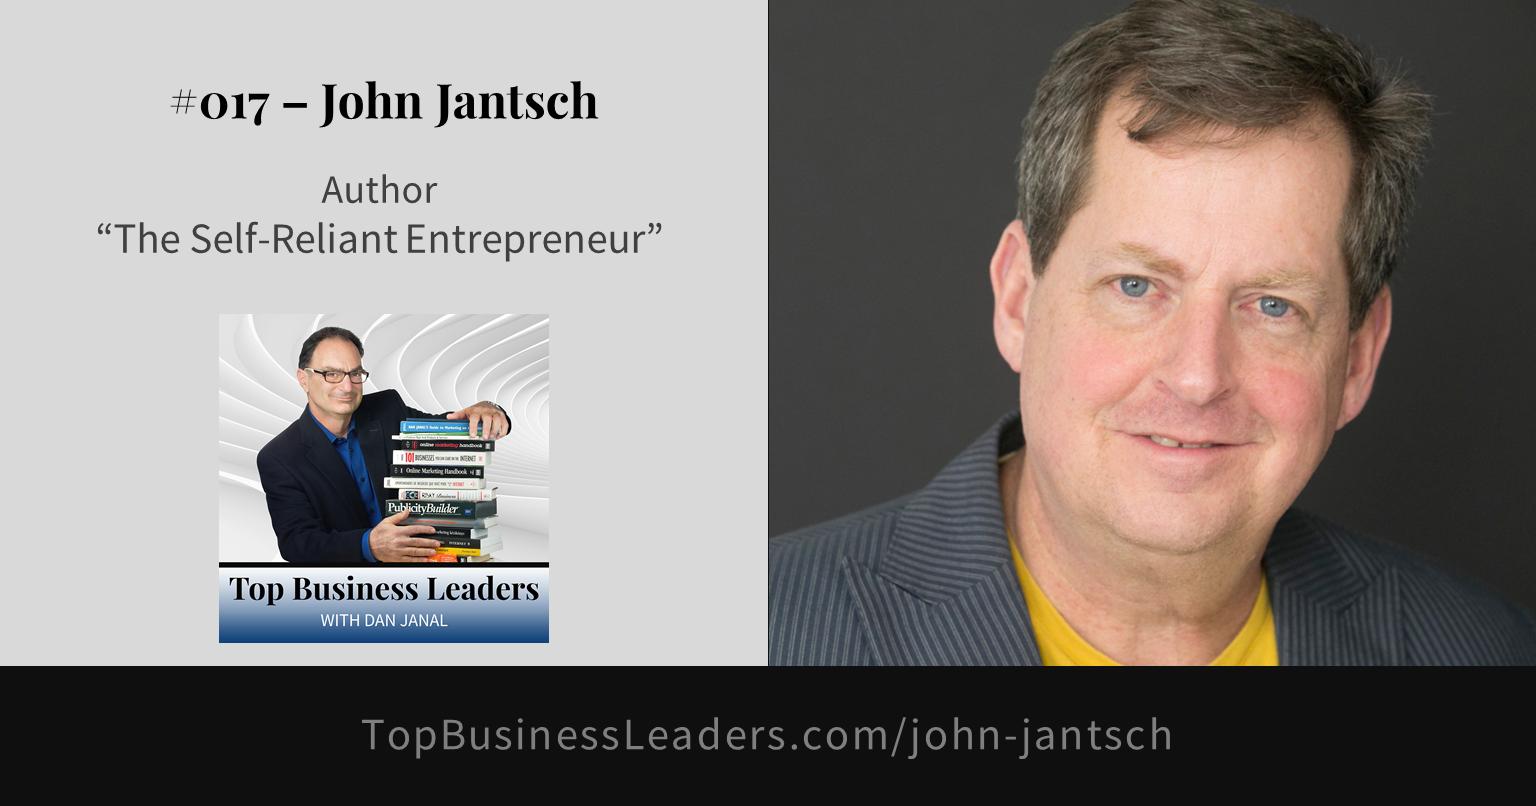 john-jantsch-author-the-self-reliant-entrepreneur